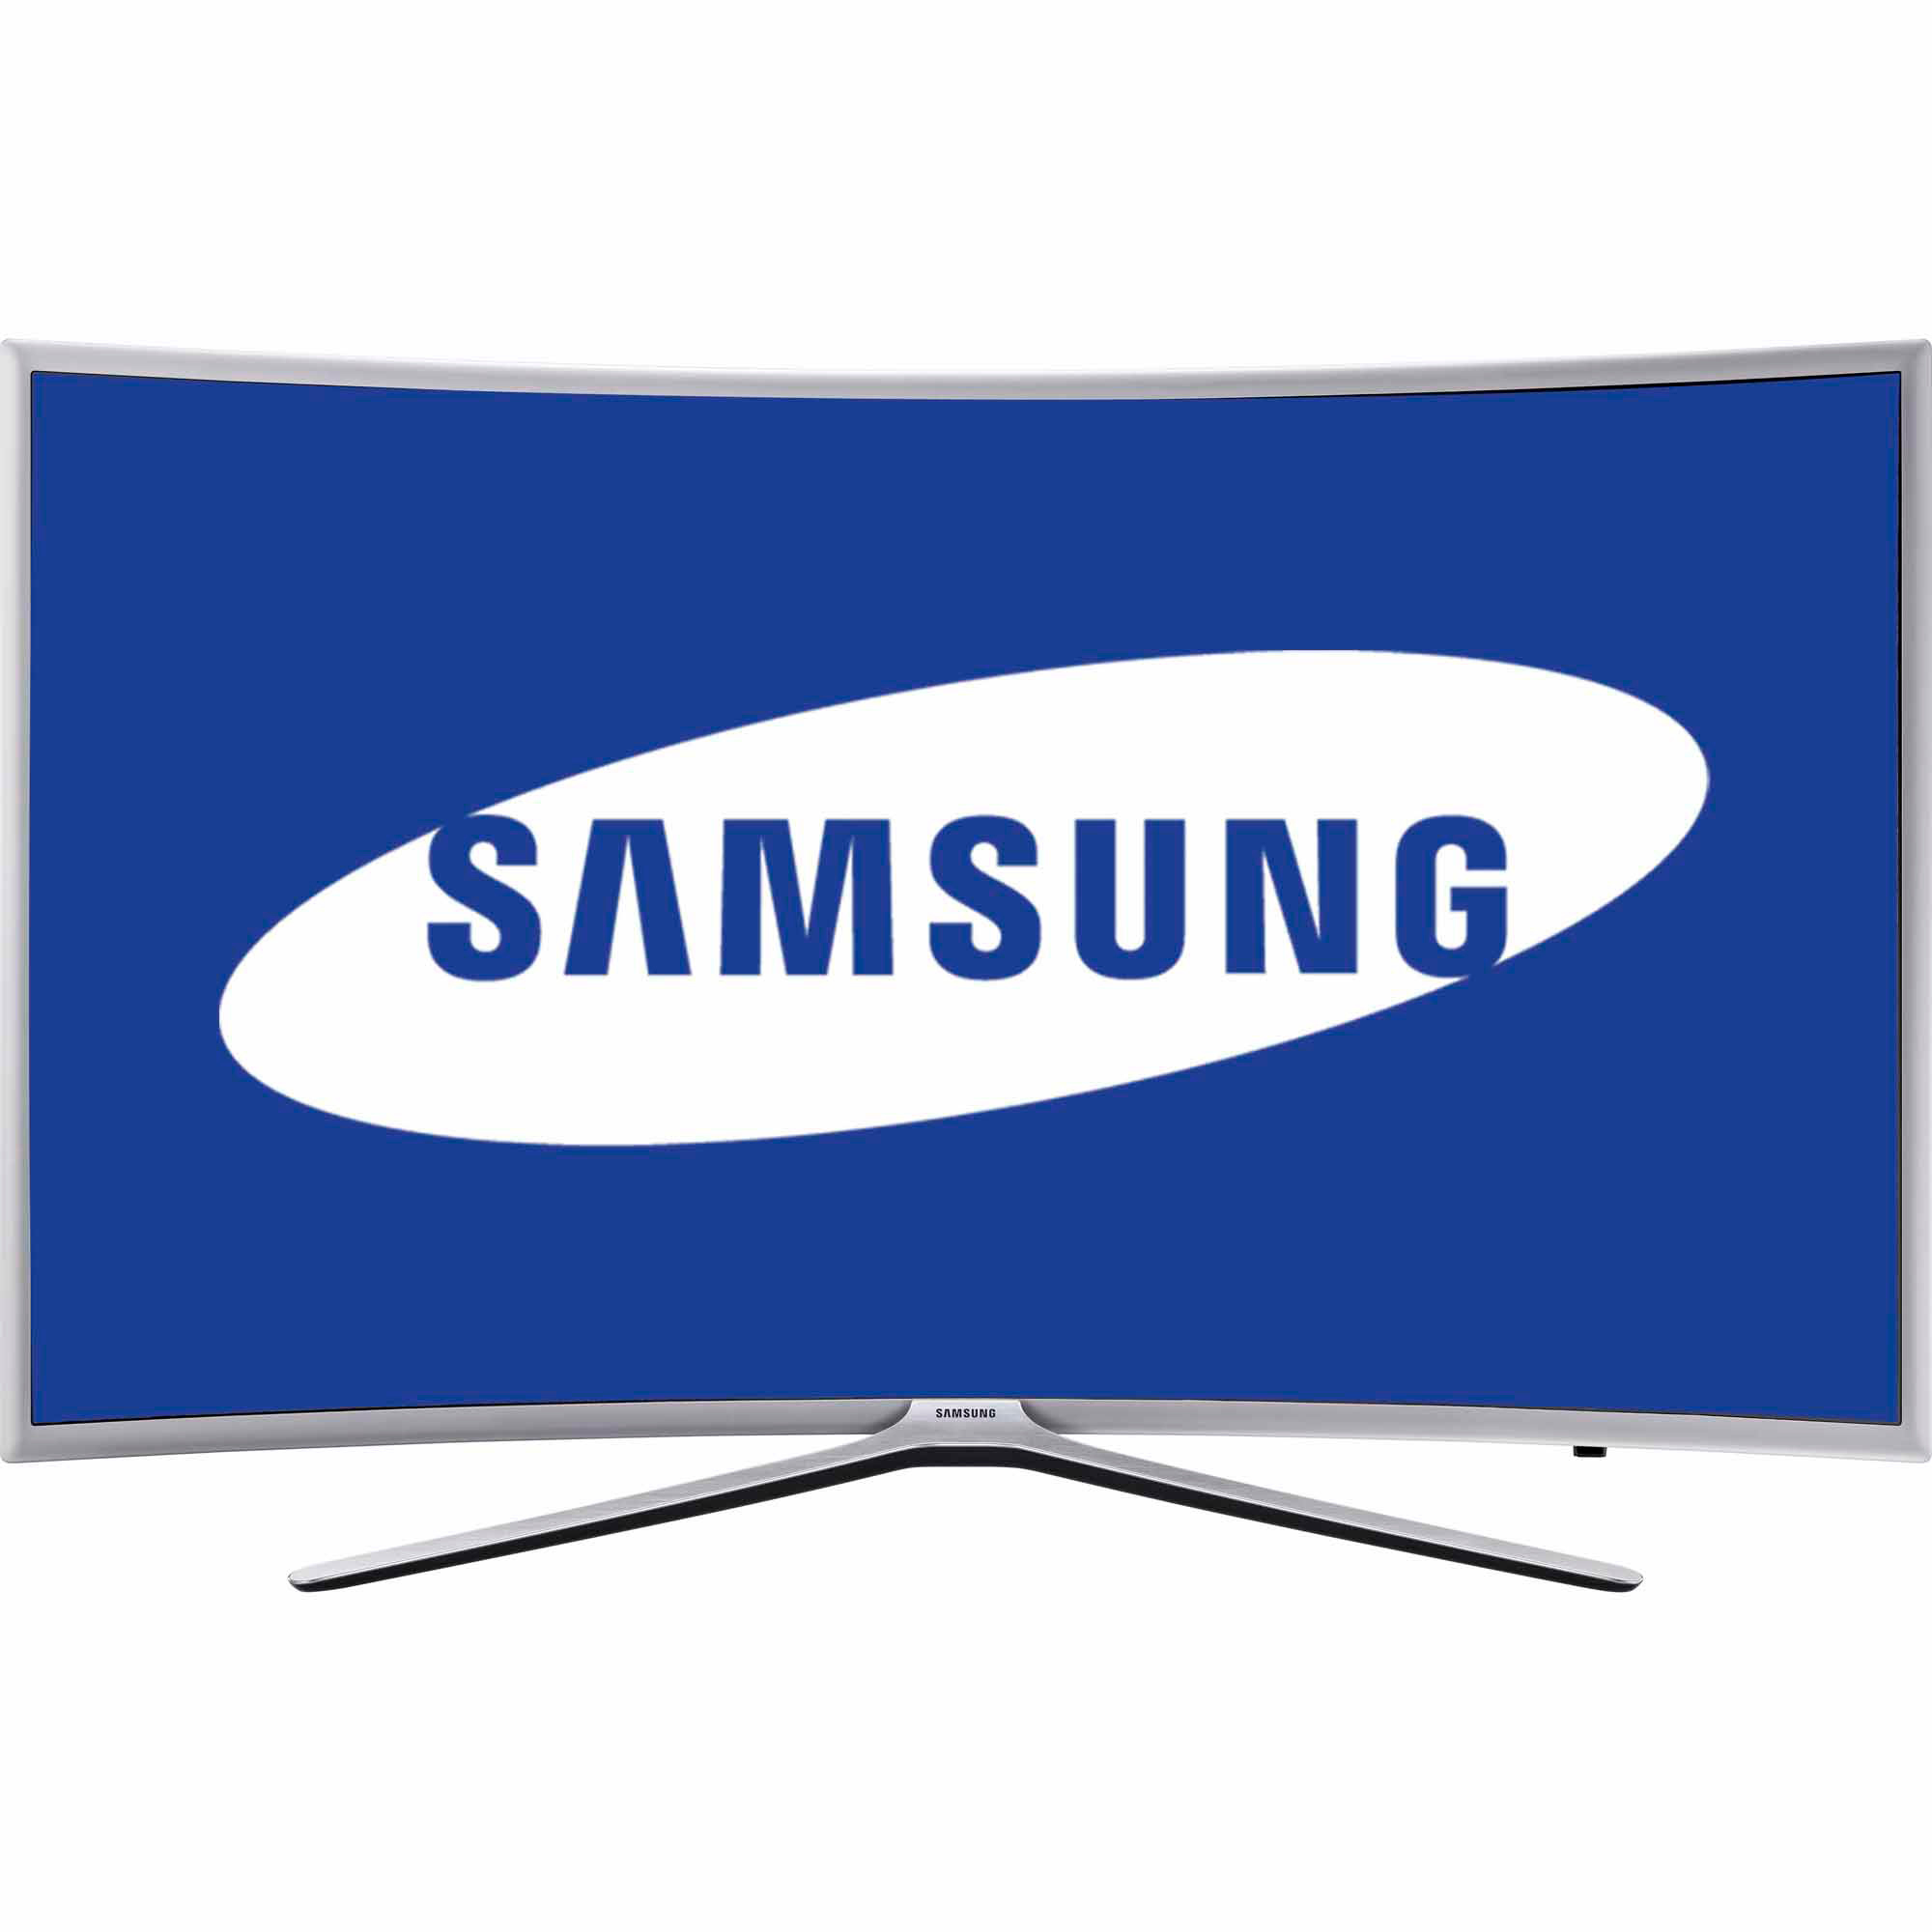 Samsung 49 Class 1080p Curved LED Smart Hdtv - UN49K6250